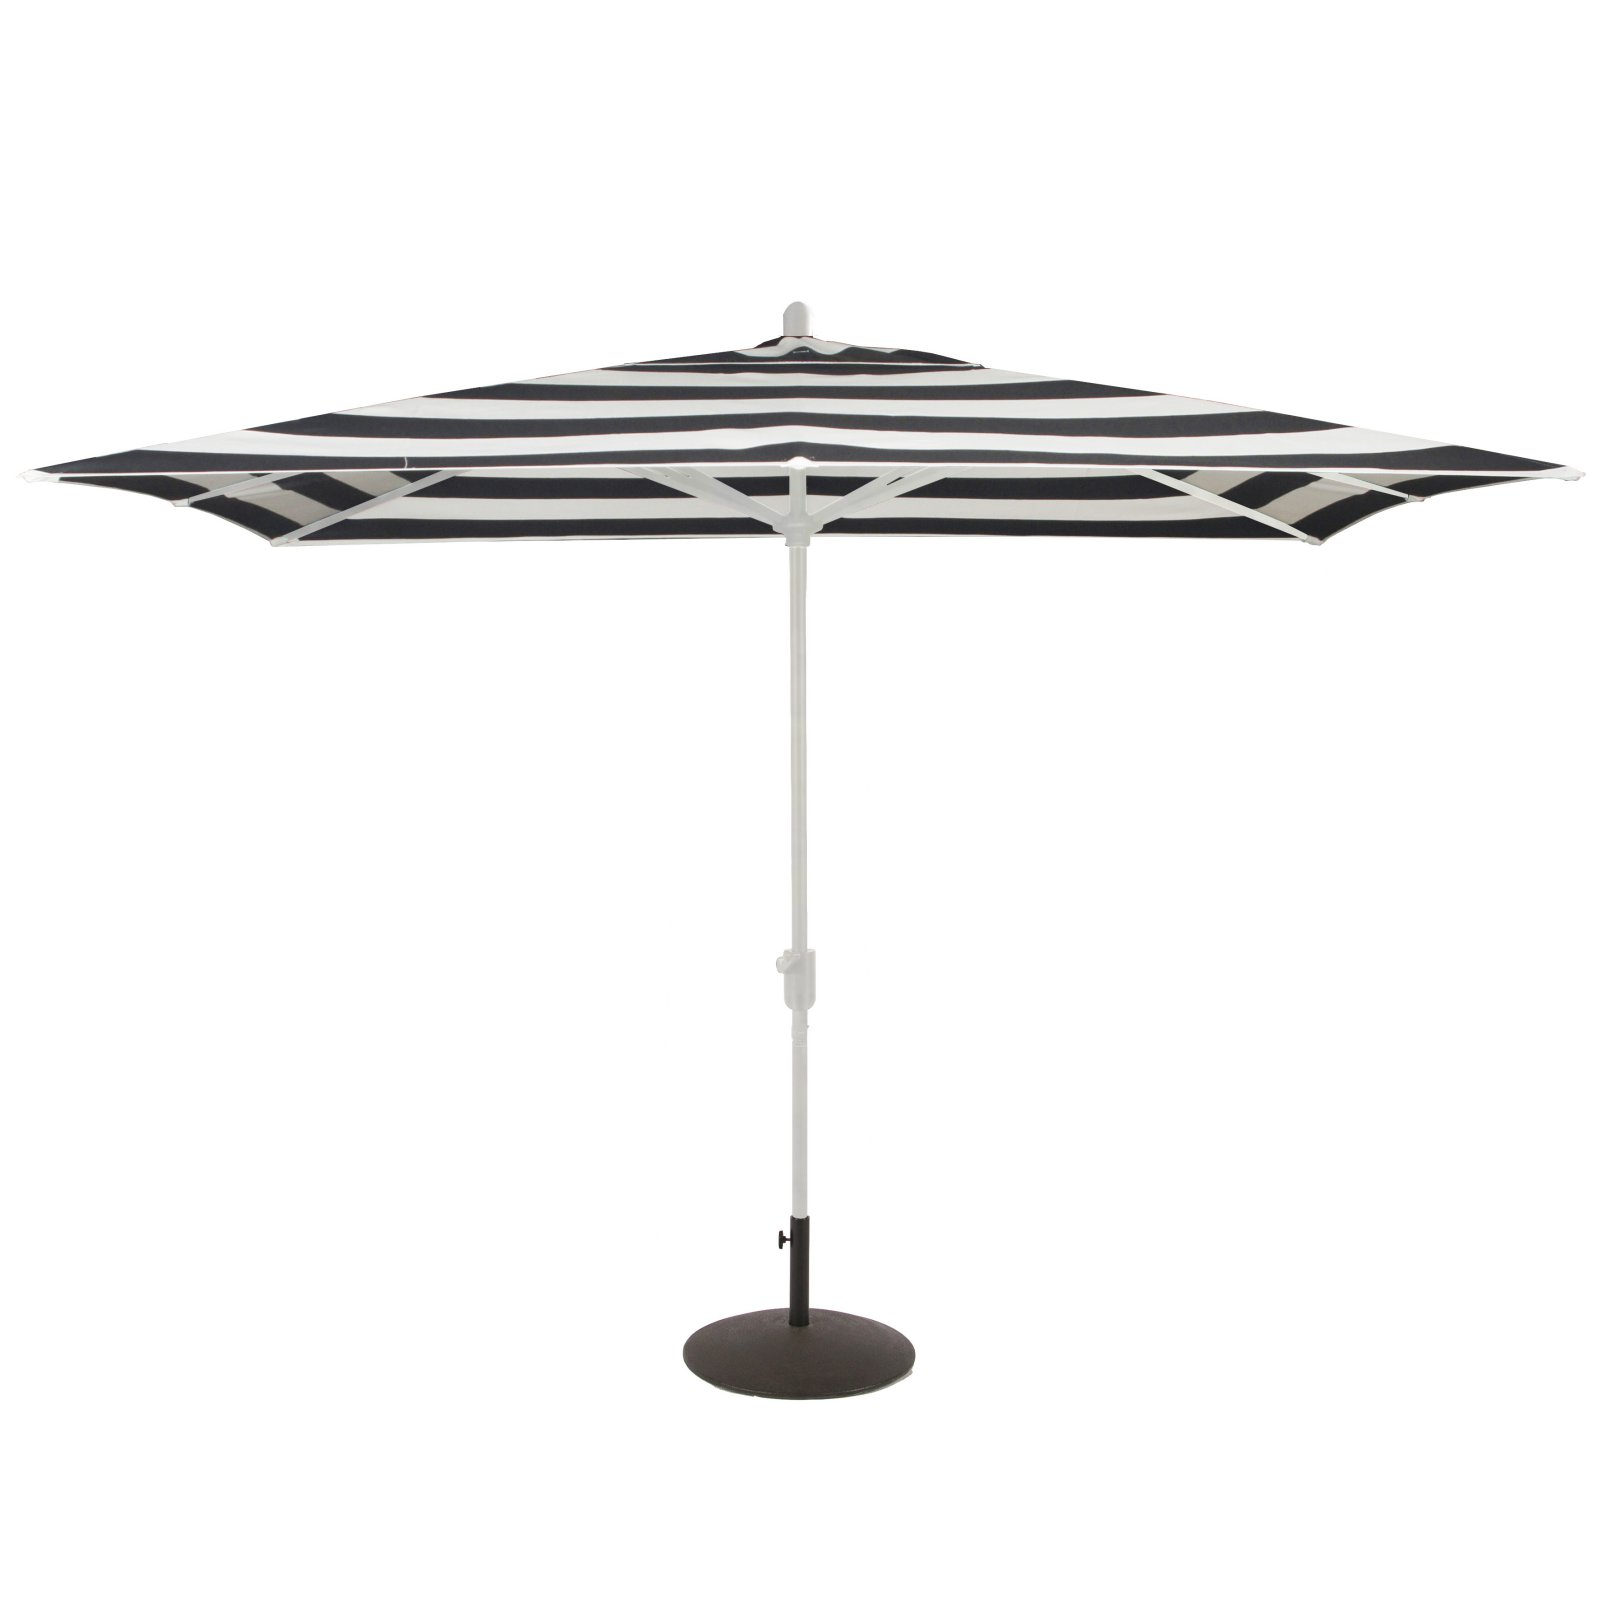 Striped Sunbrella Umbrellas – Caldwellcountytxoem In Well Liked Wiechmann Market Sunbrella Umbrellas (View 12 of 20)